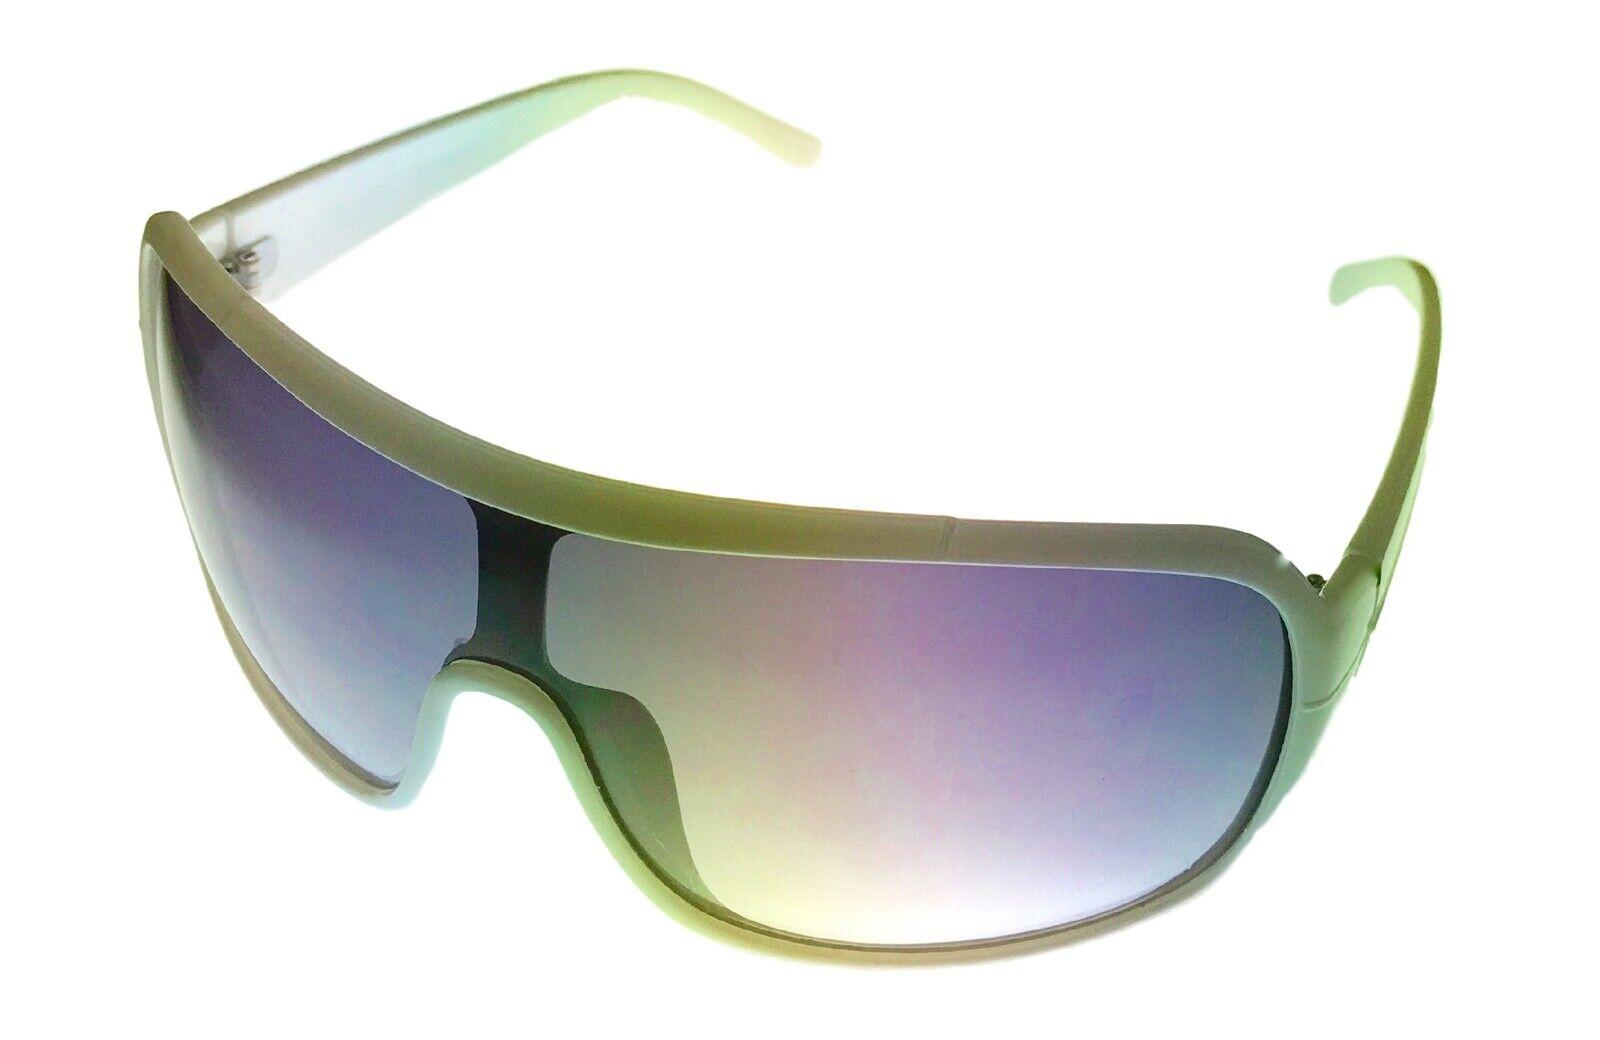 Smoke Gradient Lens PE12 4 Perry Ellis Mens Sunglass Black Plastic Wrap